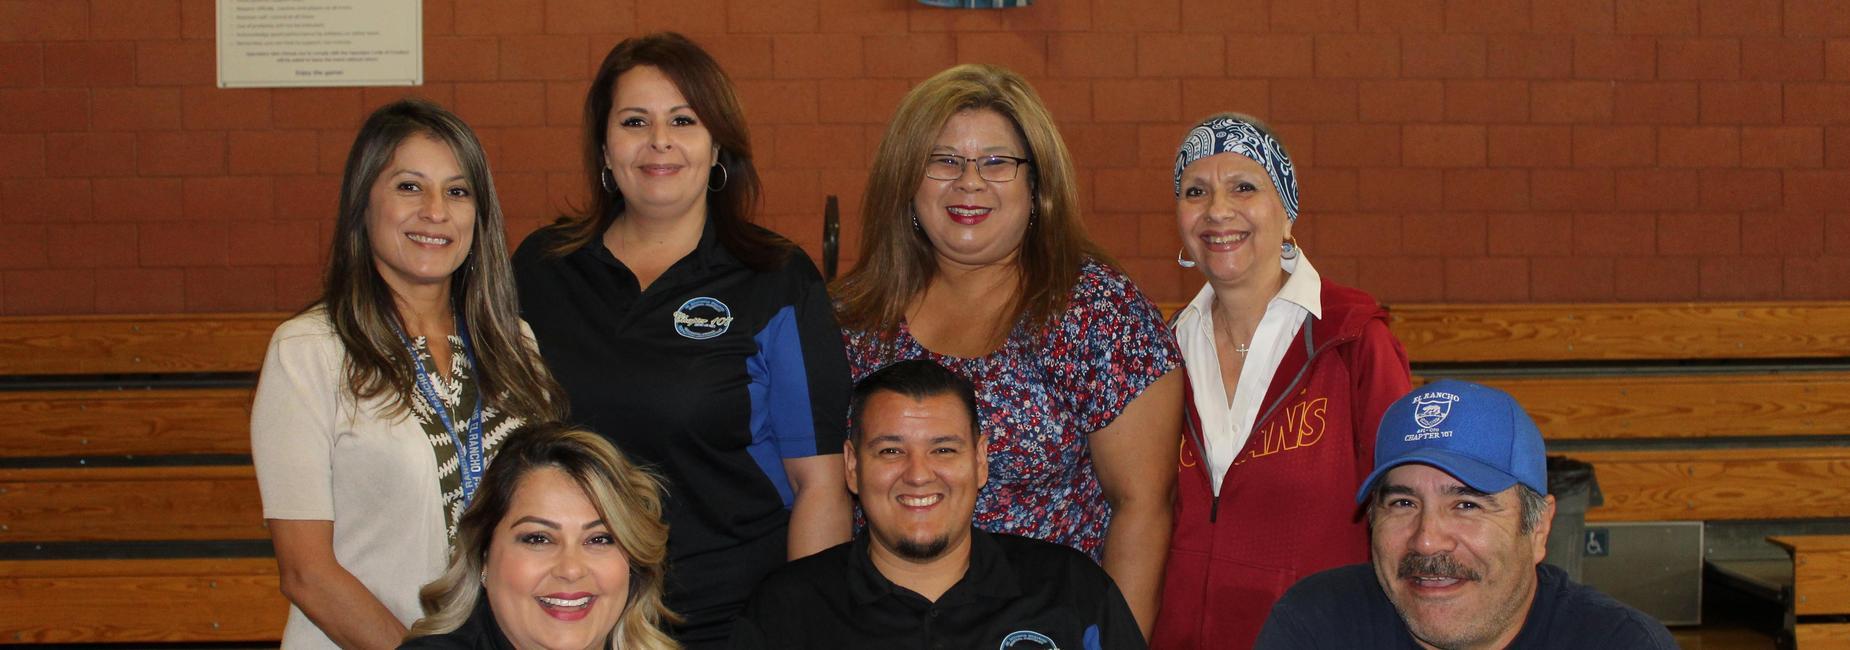 CSEA Union staff